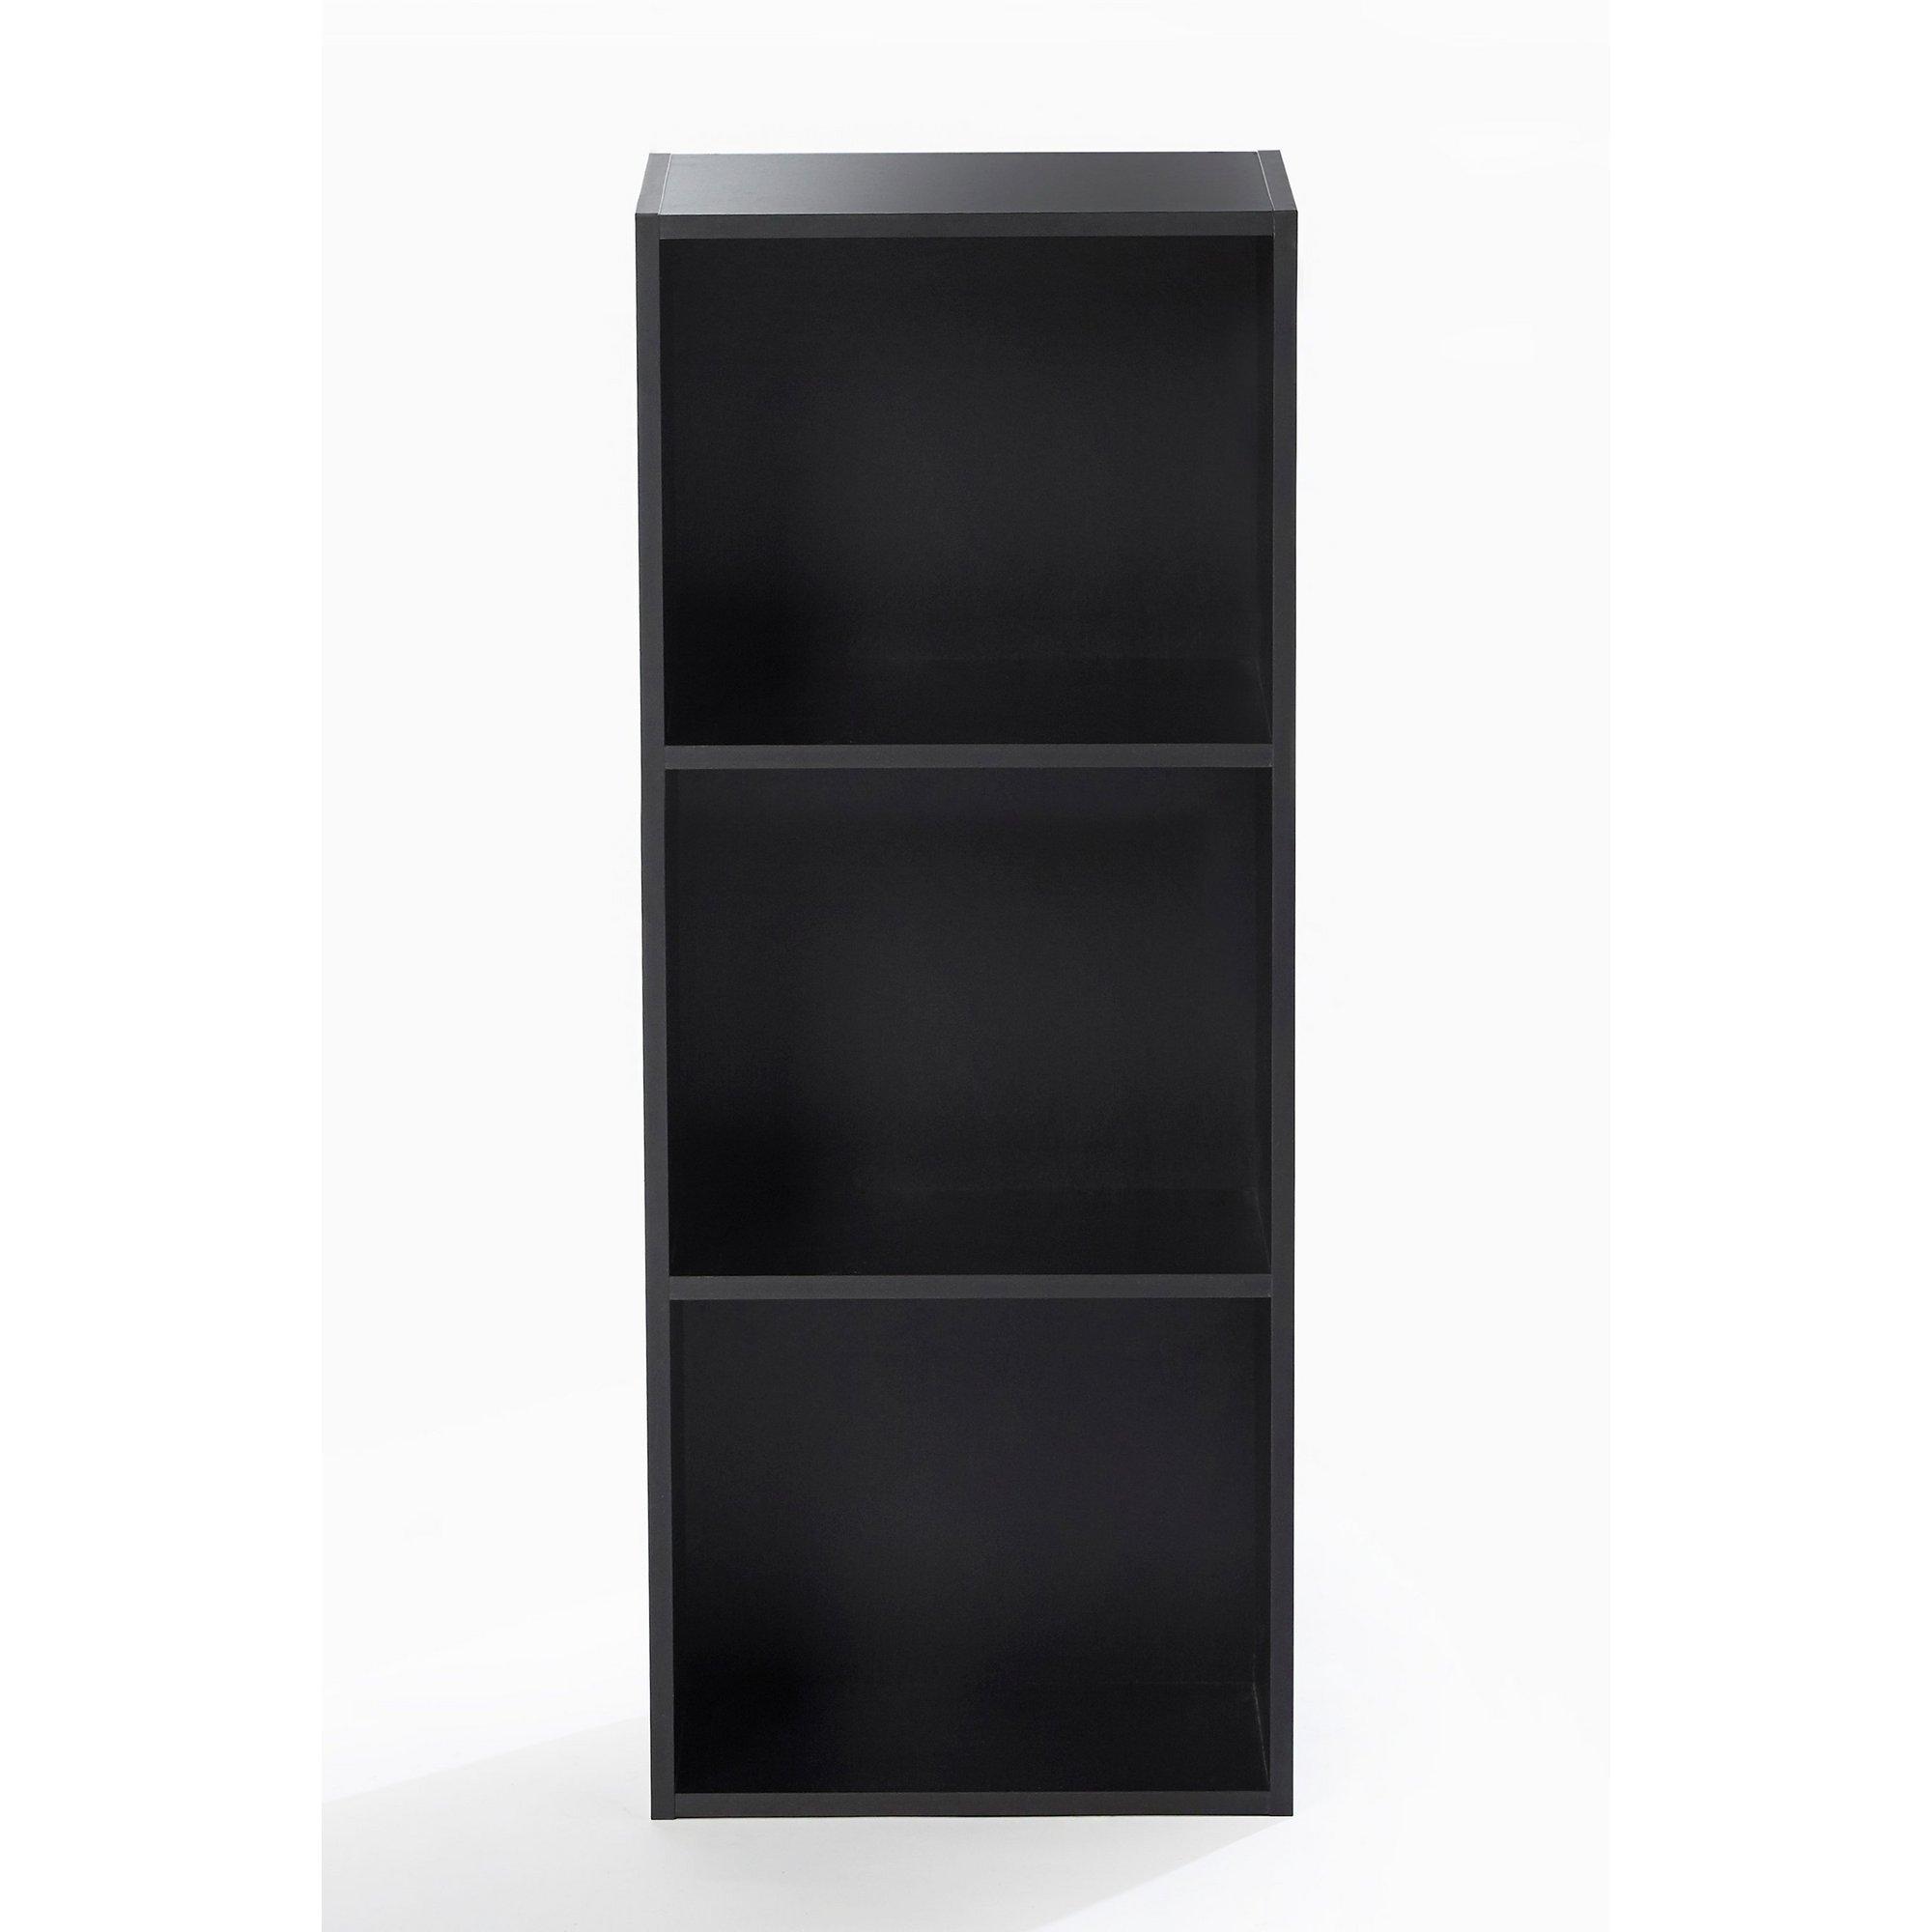 Image of 3-Tier Cube Shelf Unit